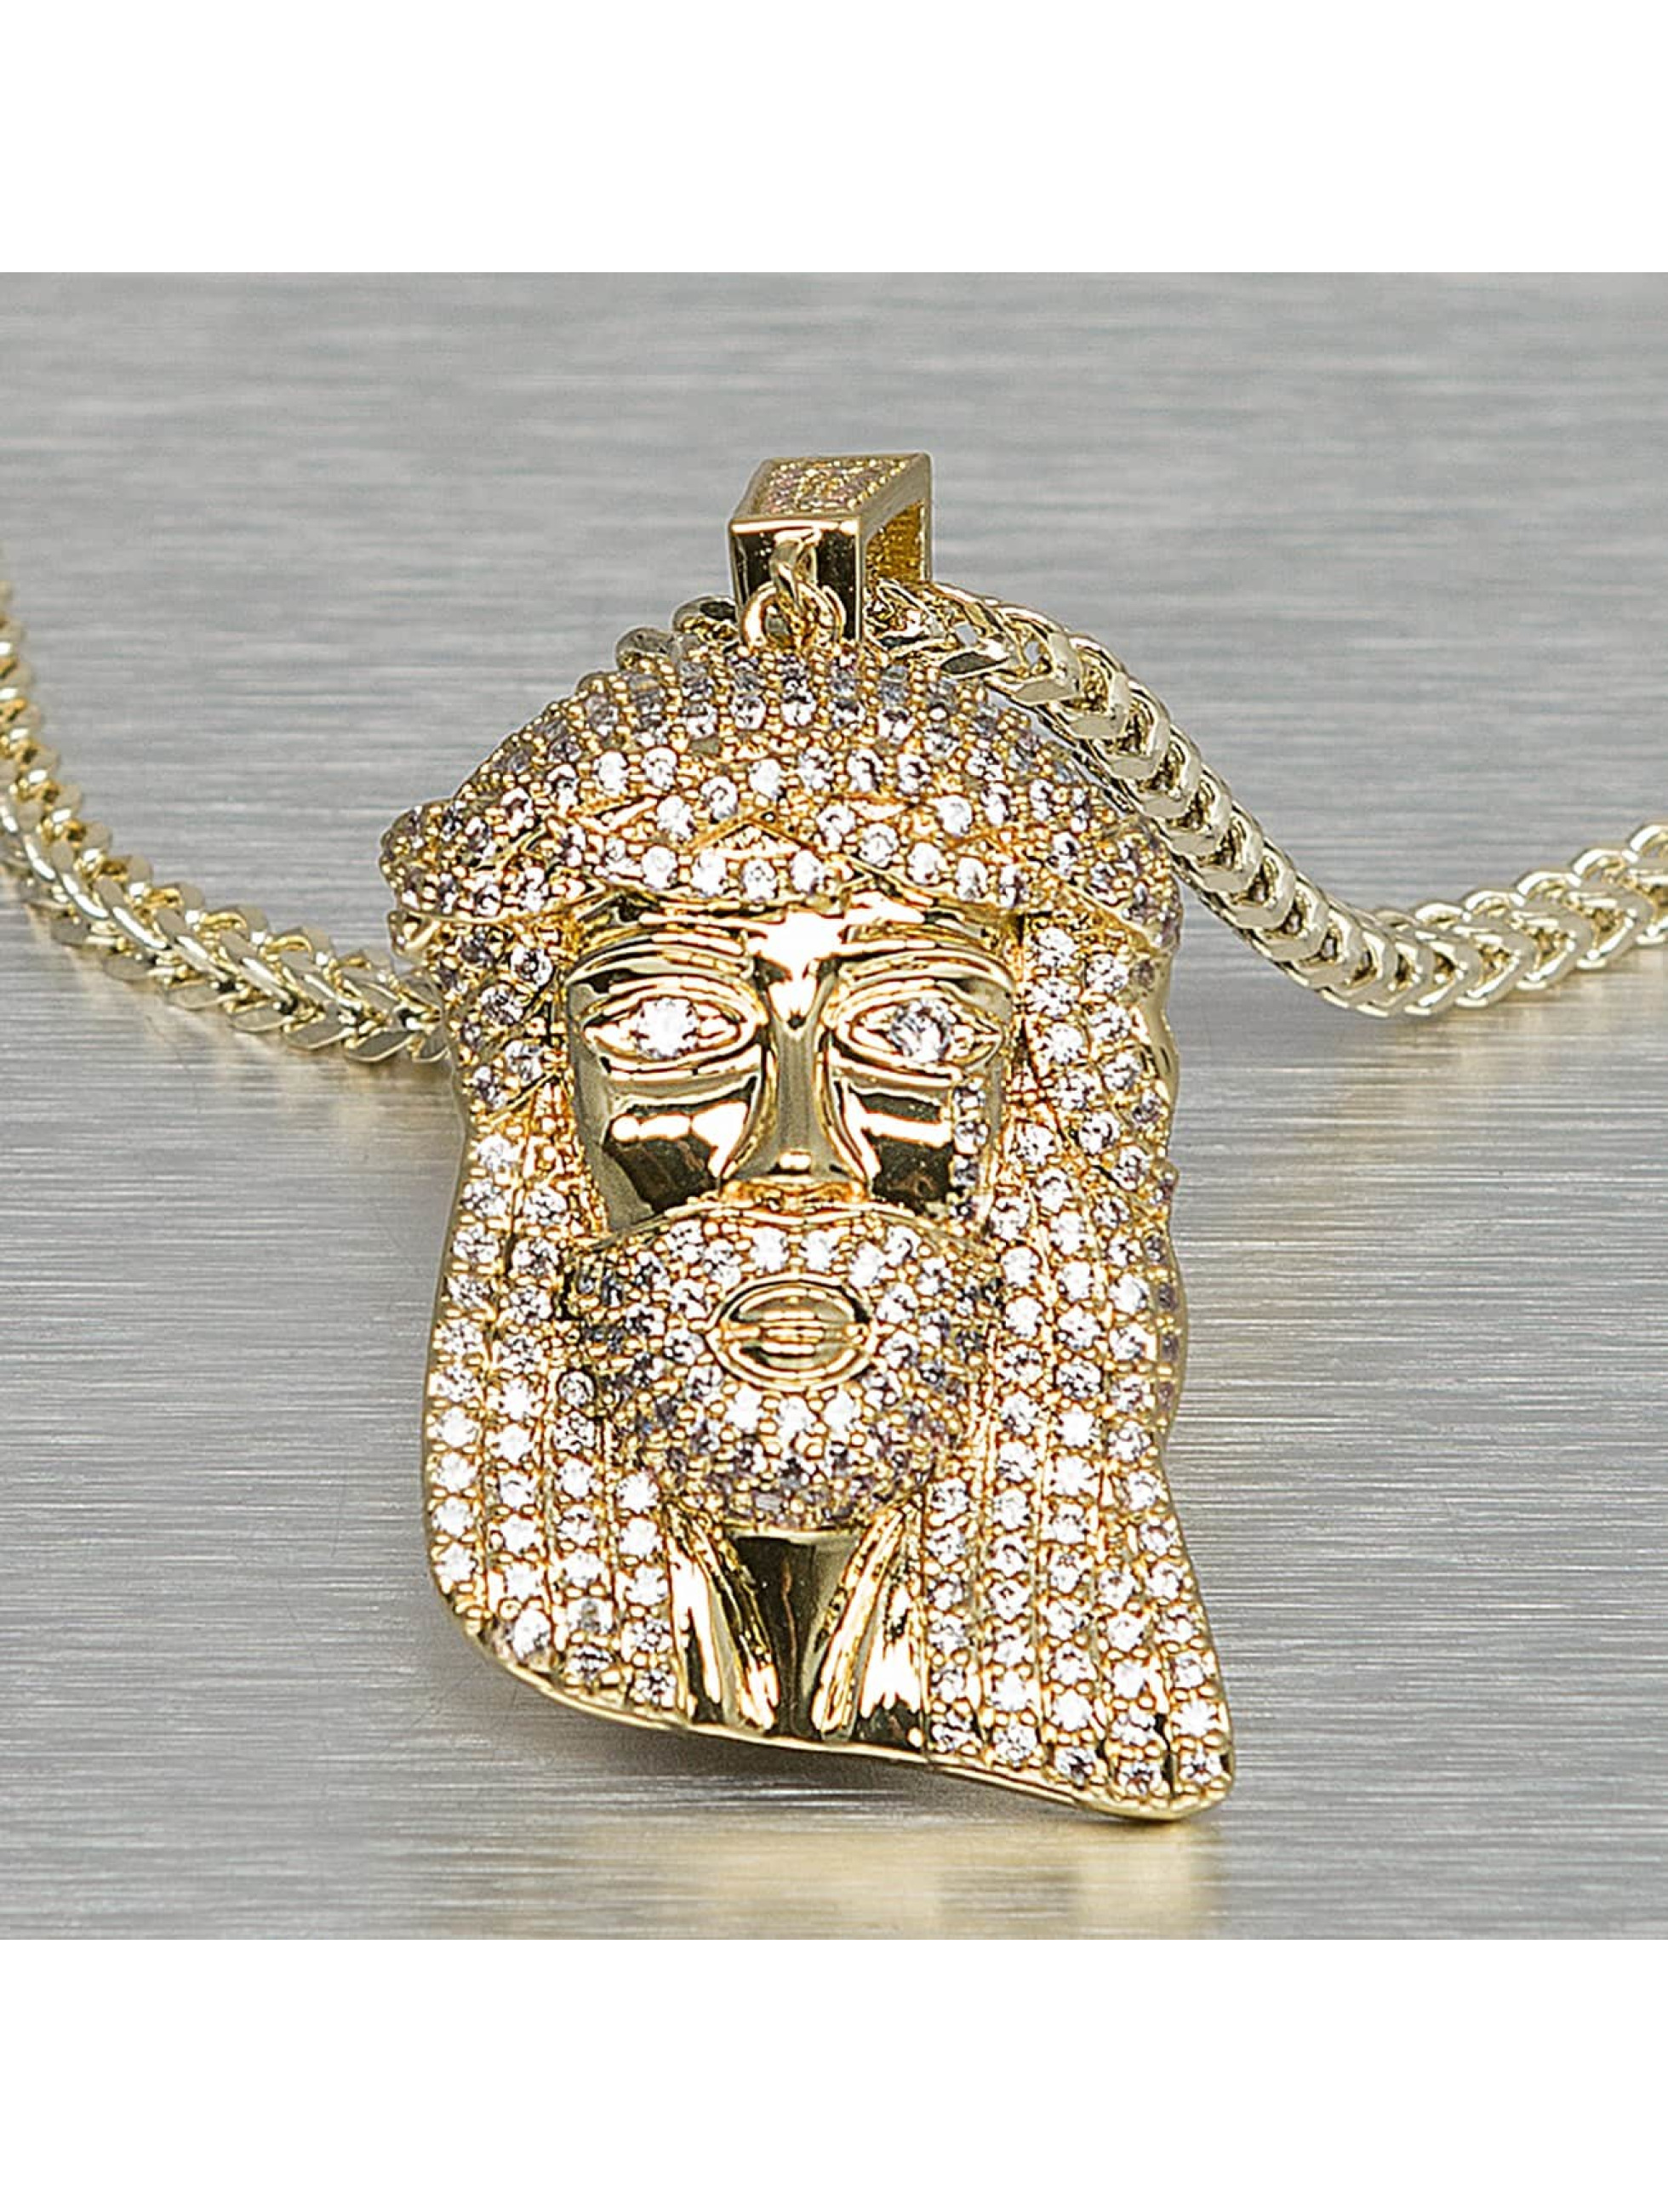 KING ICE Männer,Frauen Kette Small Solid Jesus in goldfarben